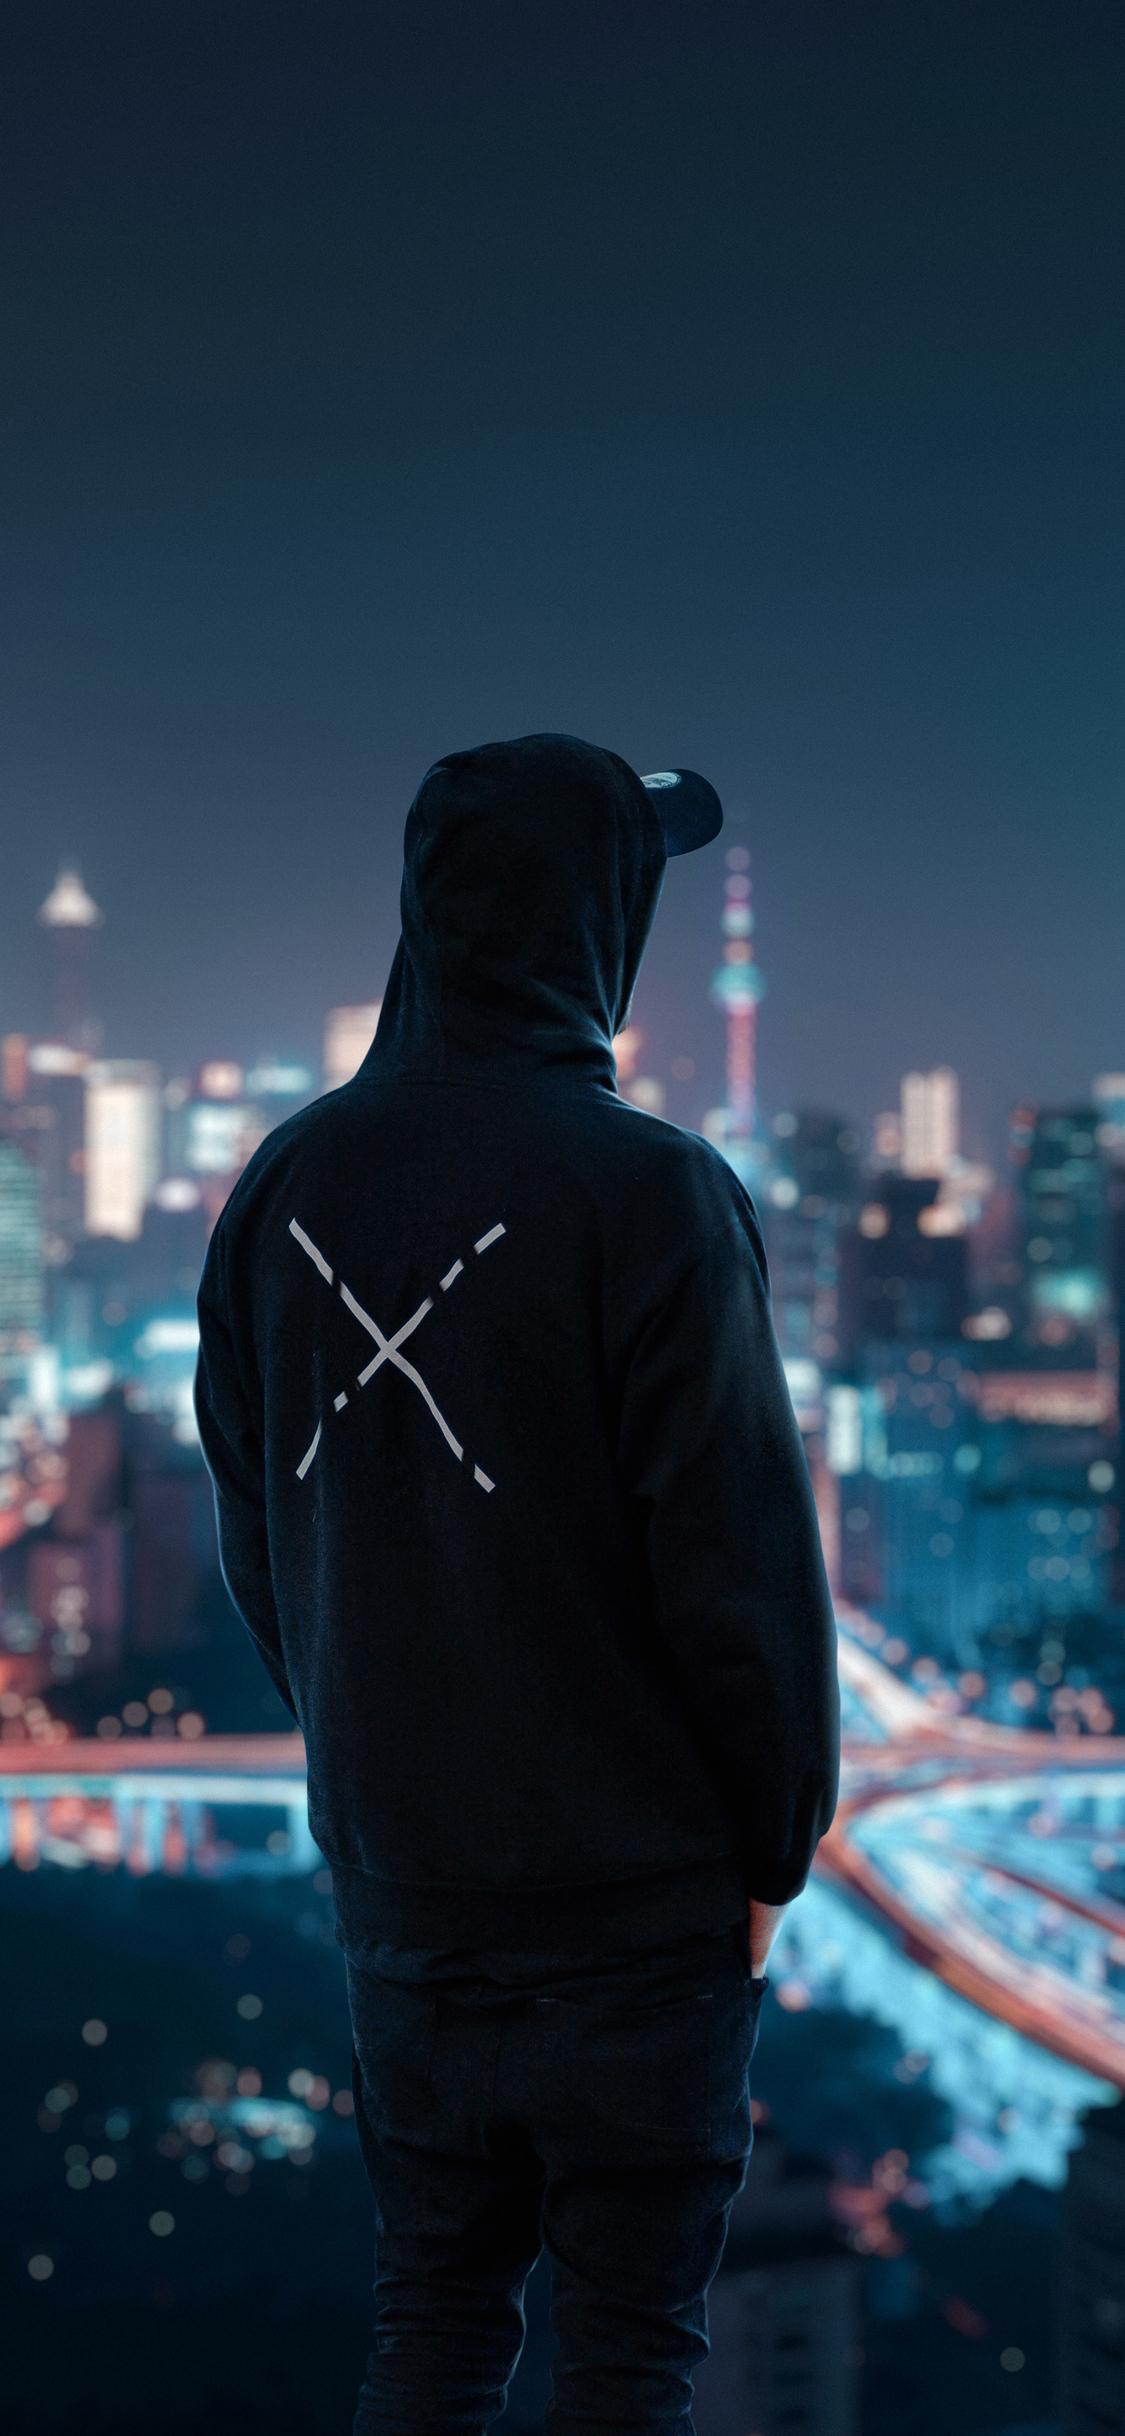 1125x2436 Hoodie Man Looking At City View 4k Iphone XS ...